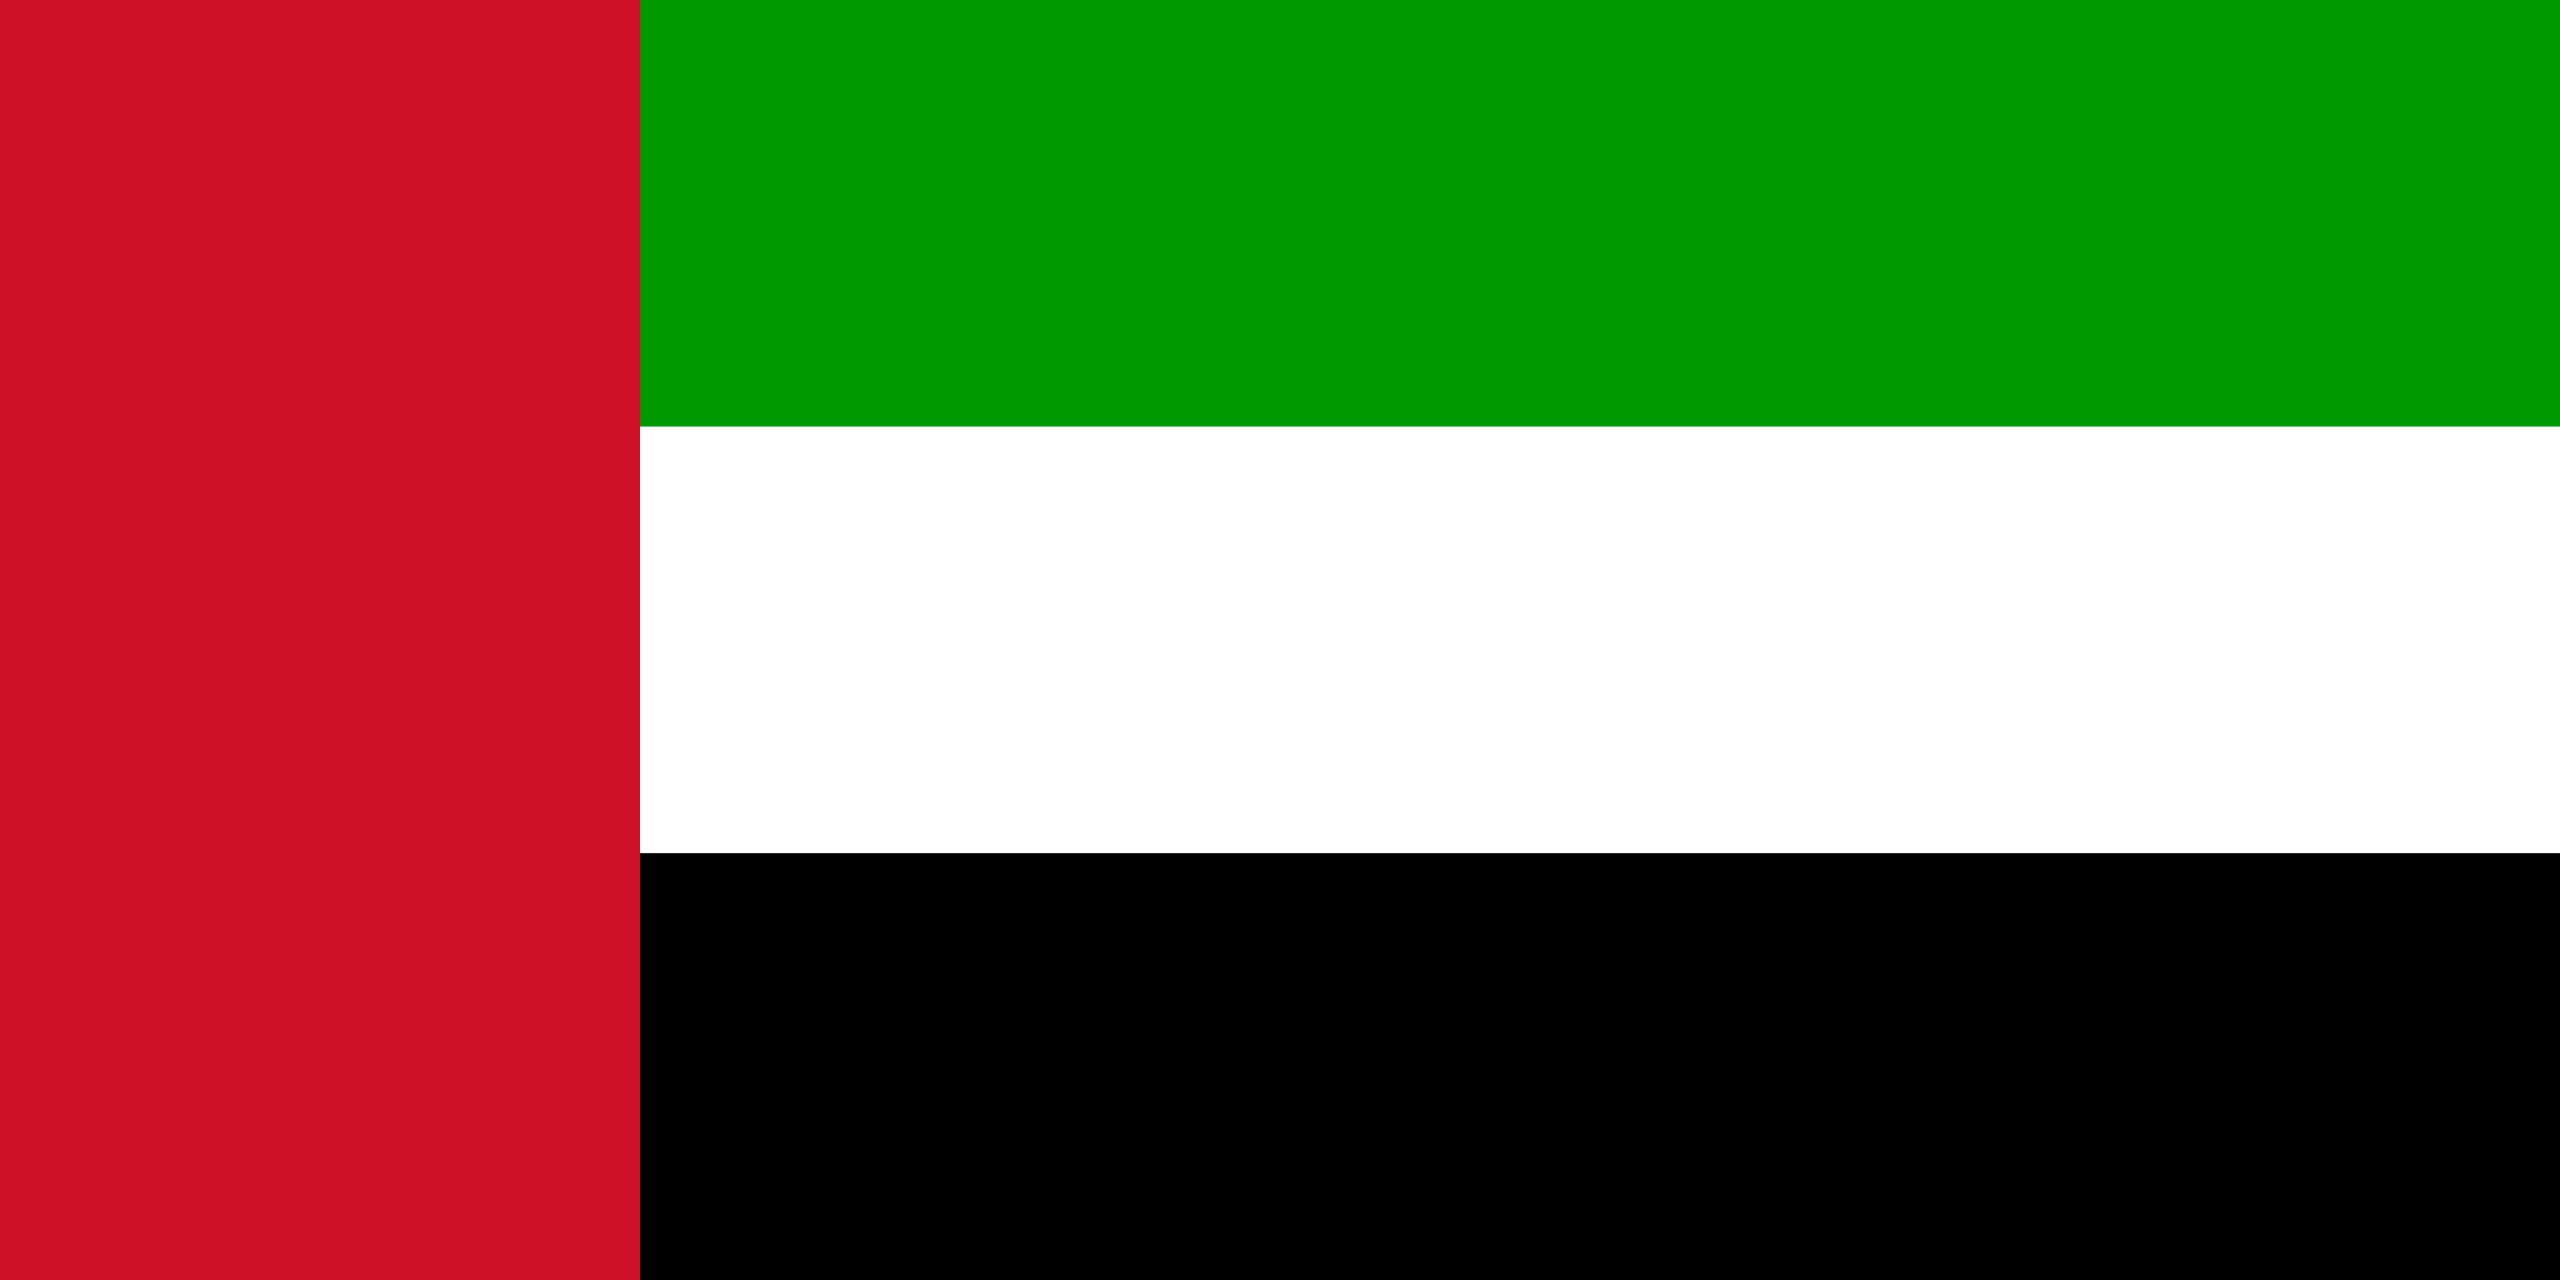 Vereinigte Arabische Emirate, Land, Emblem, Logo, Symbol - Wallpaper HD - Prof.-falken.com